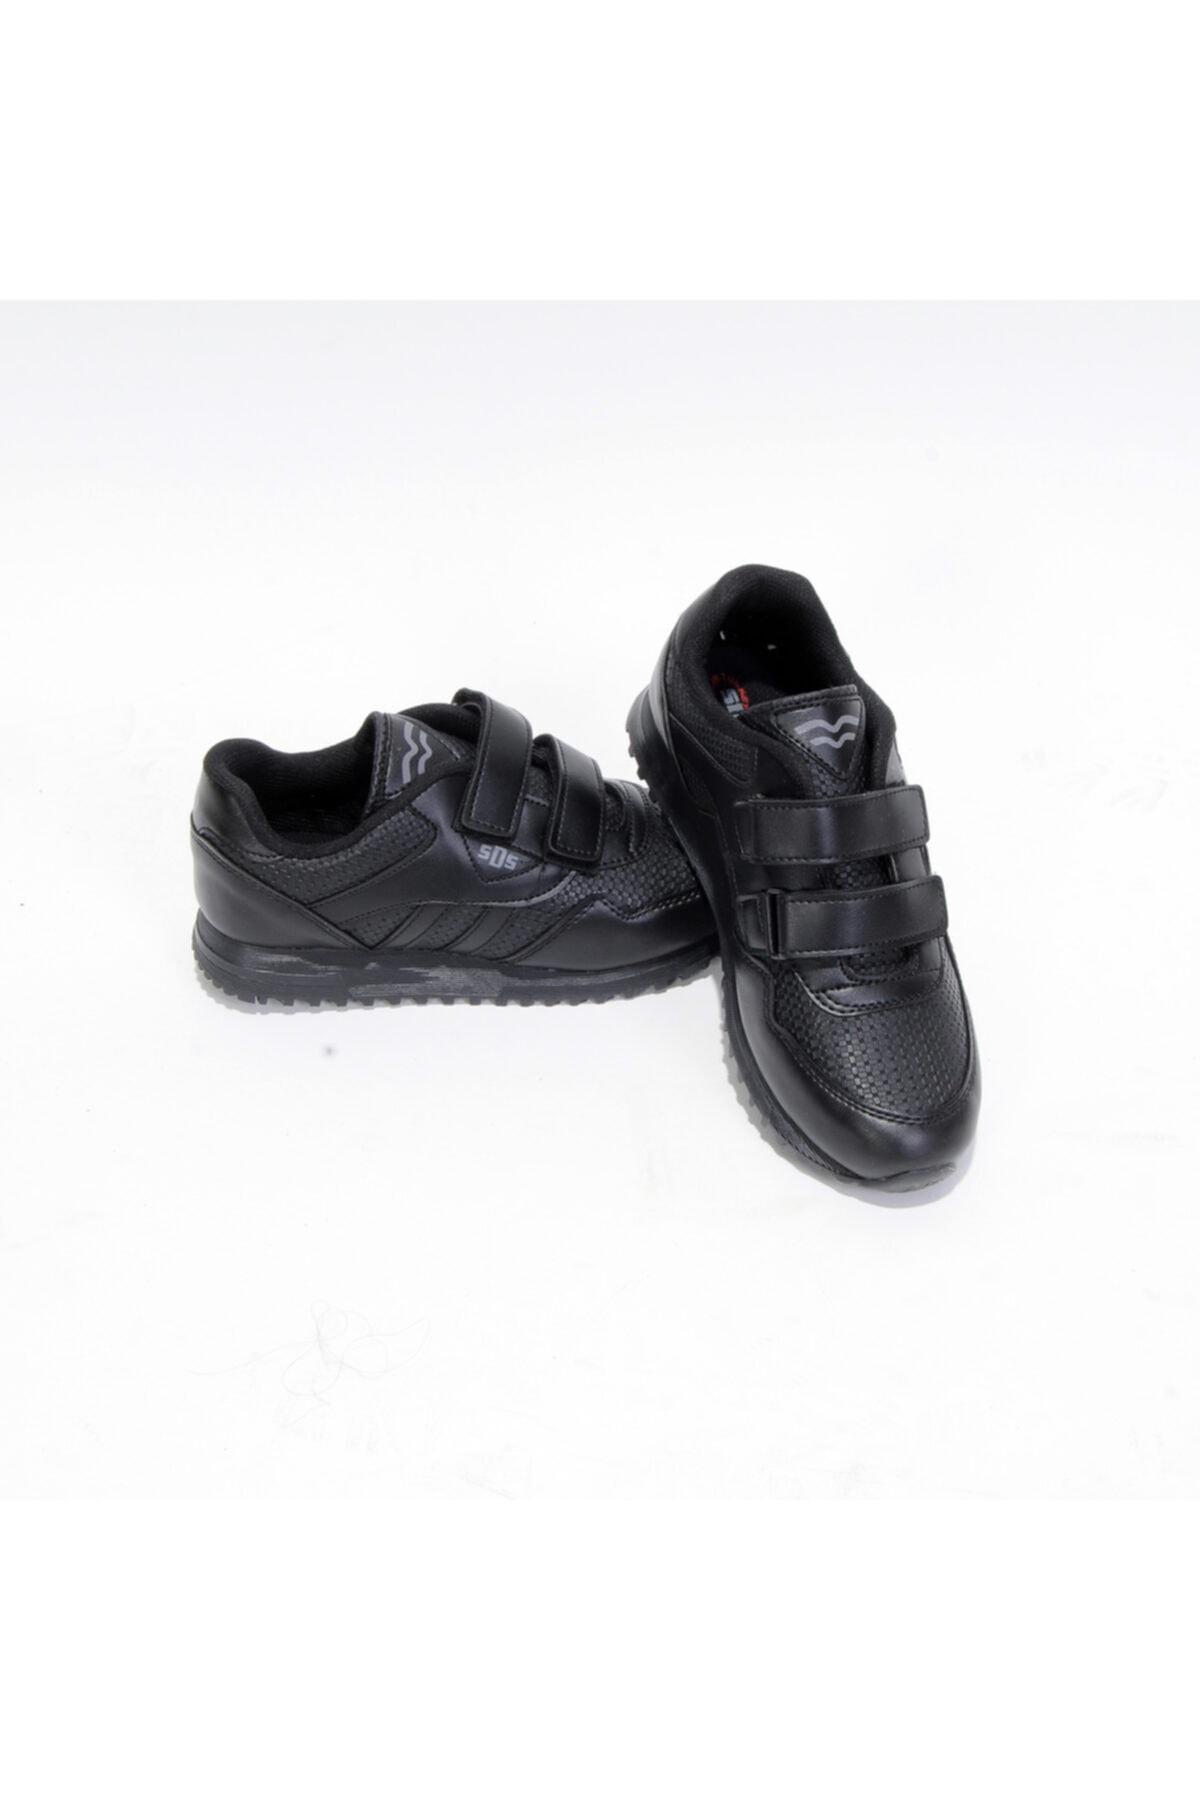 Sidasa 361-g Cırtlı Siyah-siyah Cilt Spor Ayakkabı 1